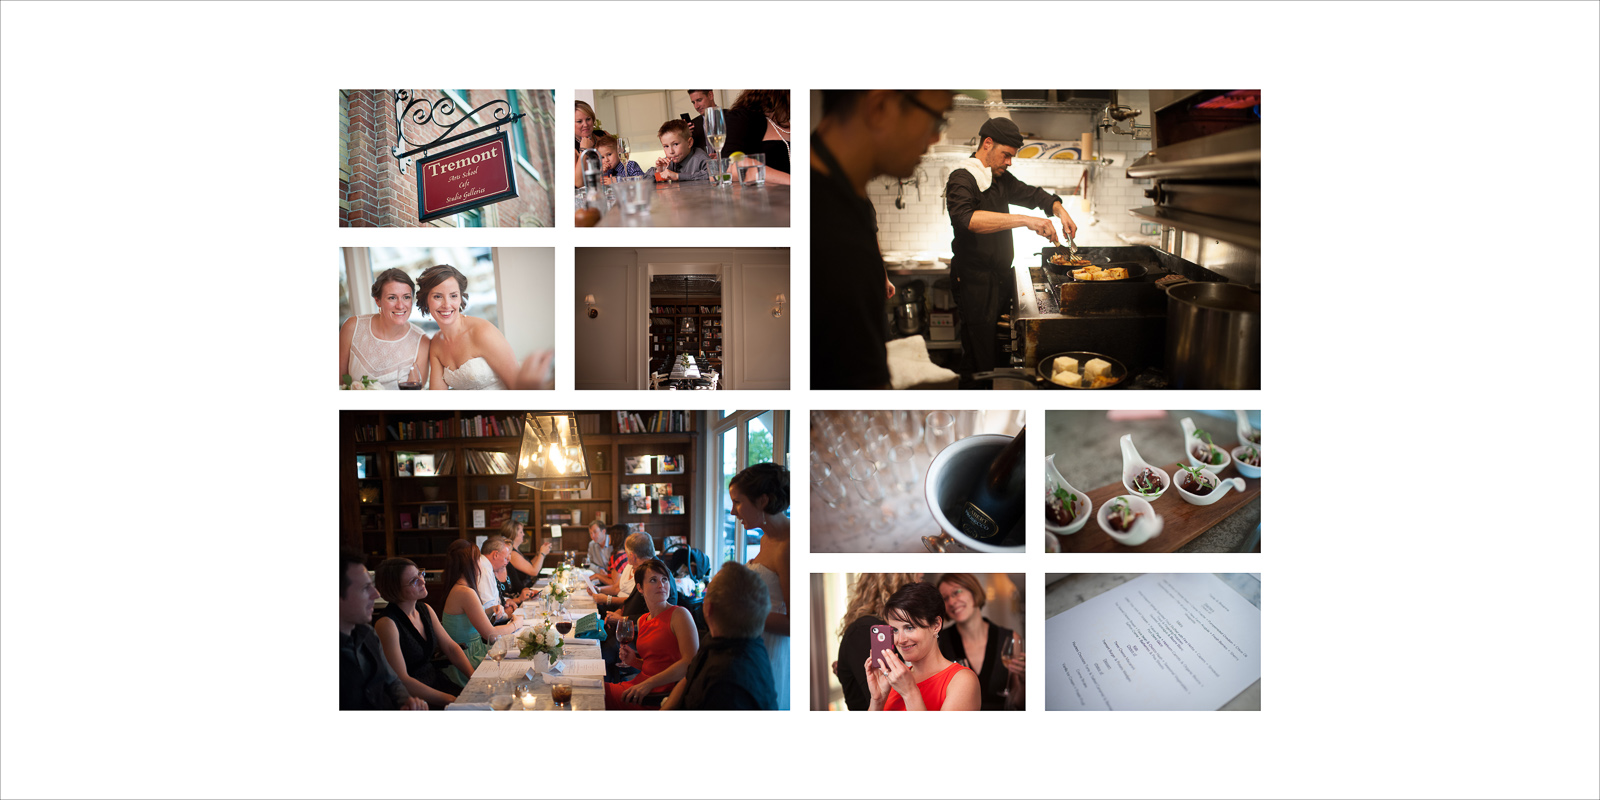 collingwood-wedding-photo-album-017.jpg